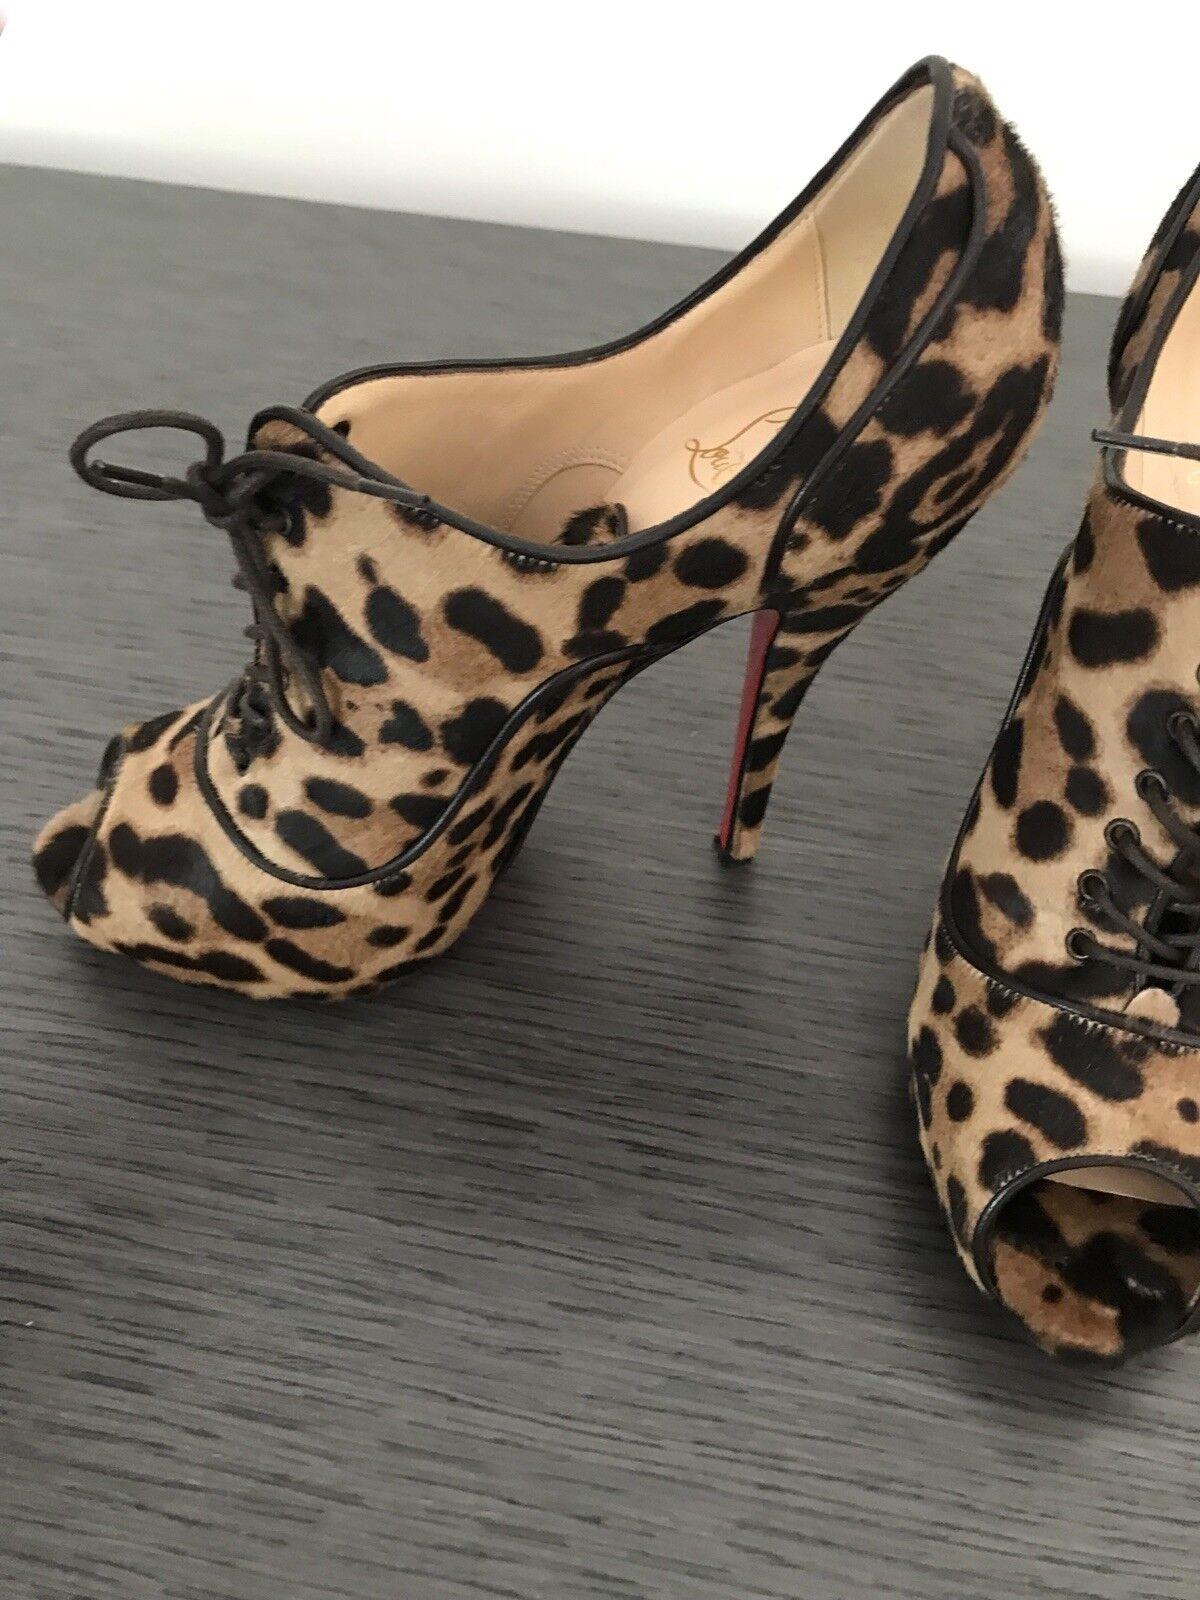 Christian Louboutin Leopard Peep Toe Stiefelie Stiefelie Toe Calfhair d2d233